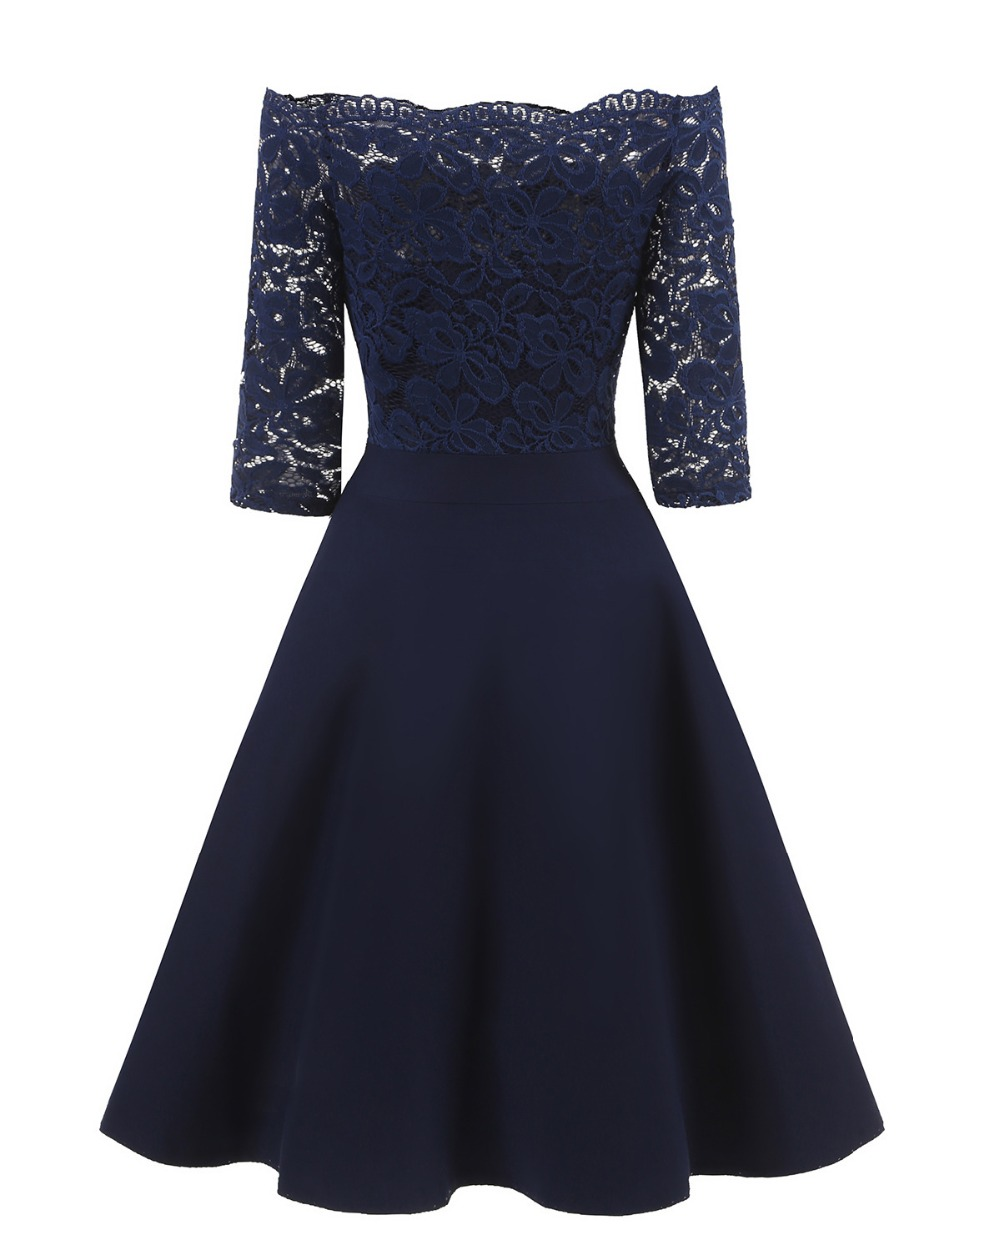 2018 Hot Sale Tulle Applique Short Prom   Dress   Party Half Sleeves   Cocktail     Dresses   Vestidos De Coctel Robe